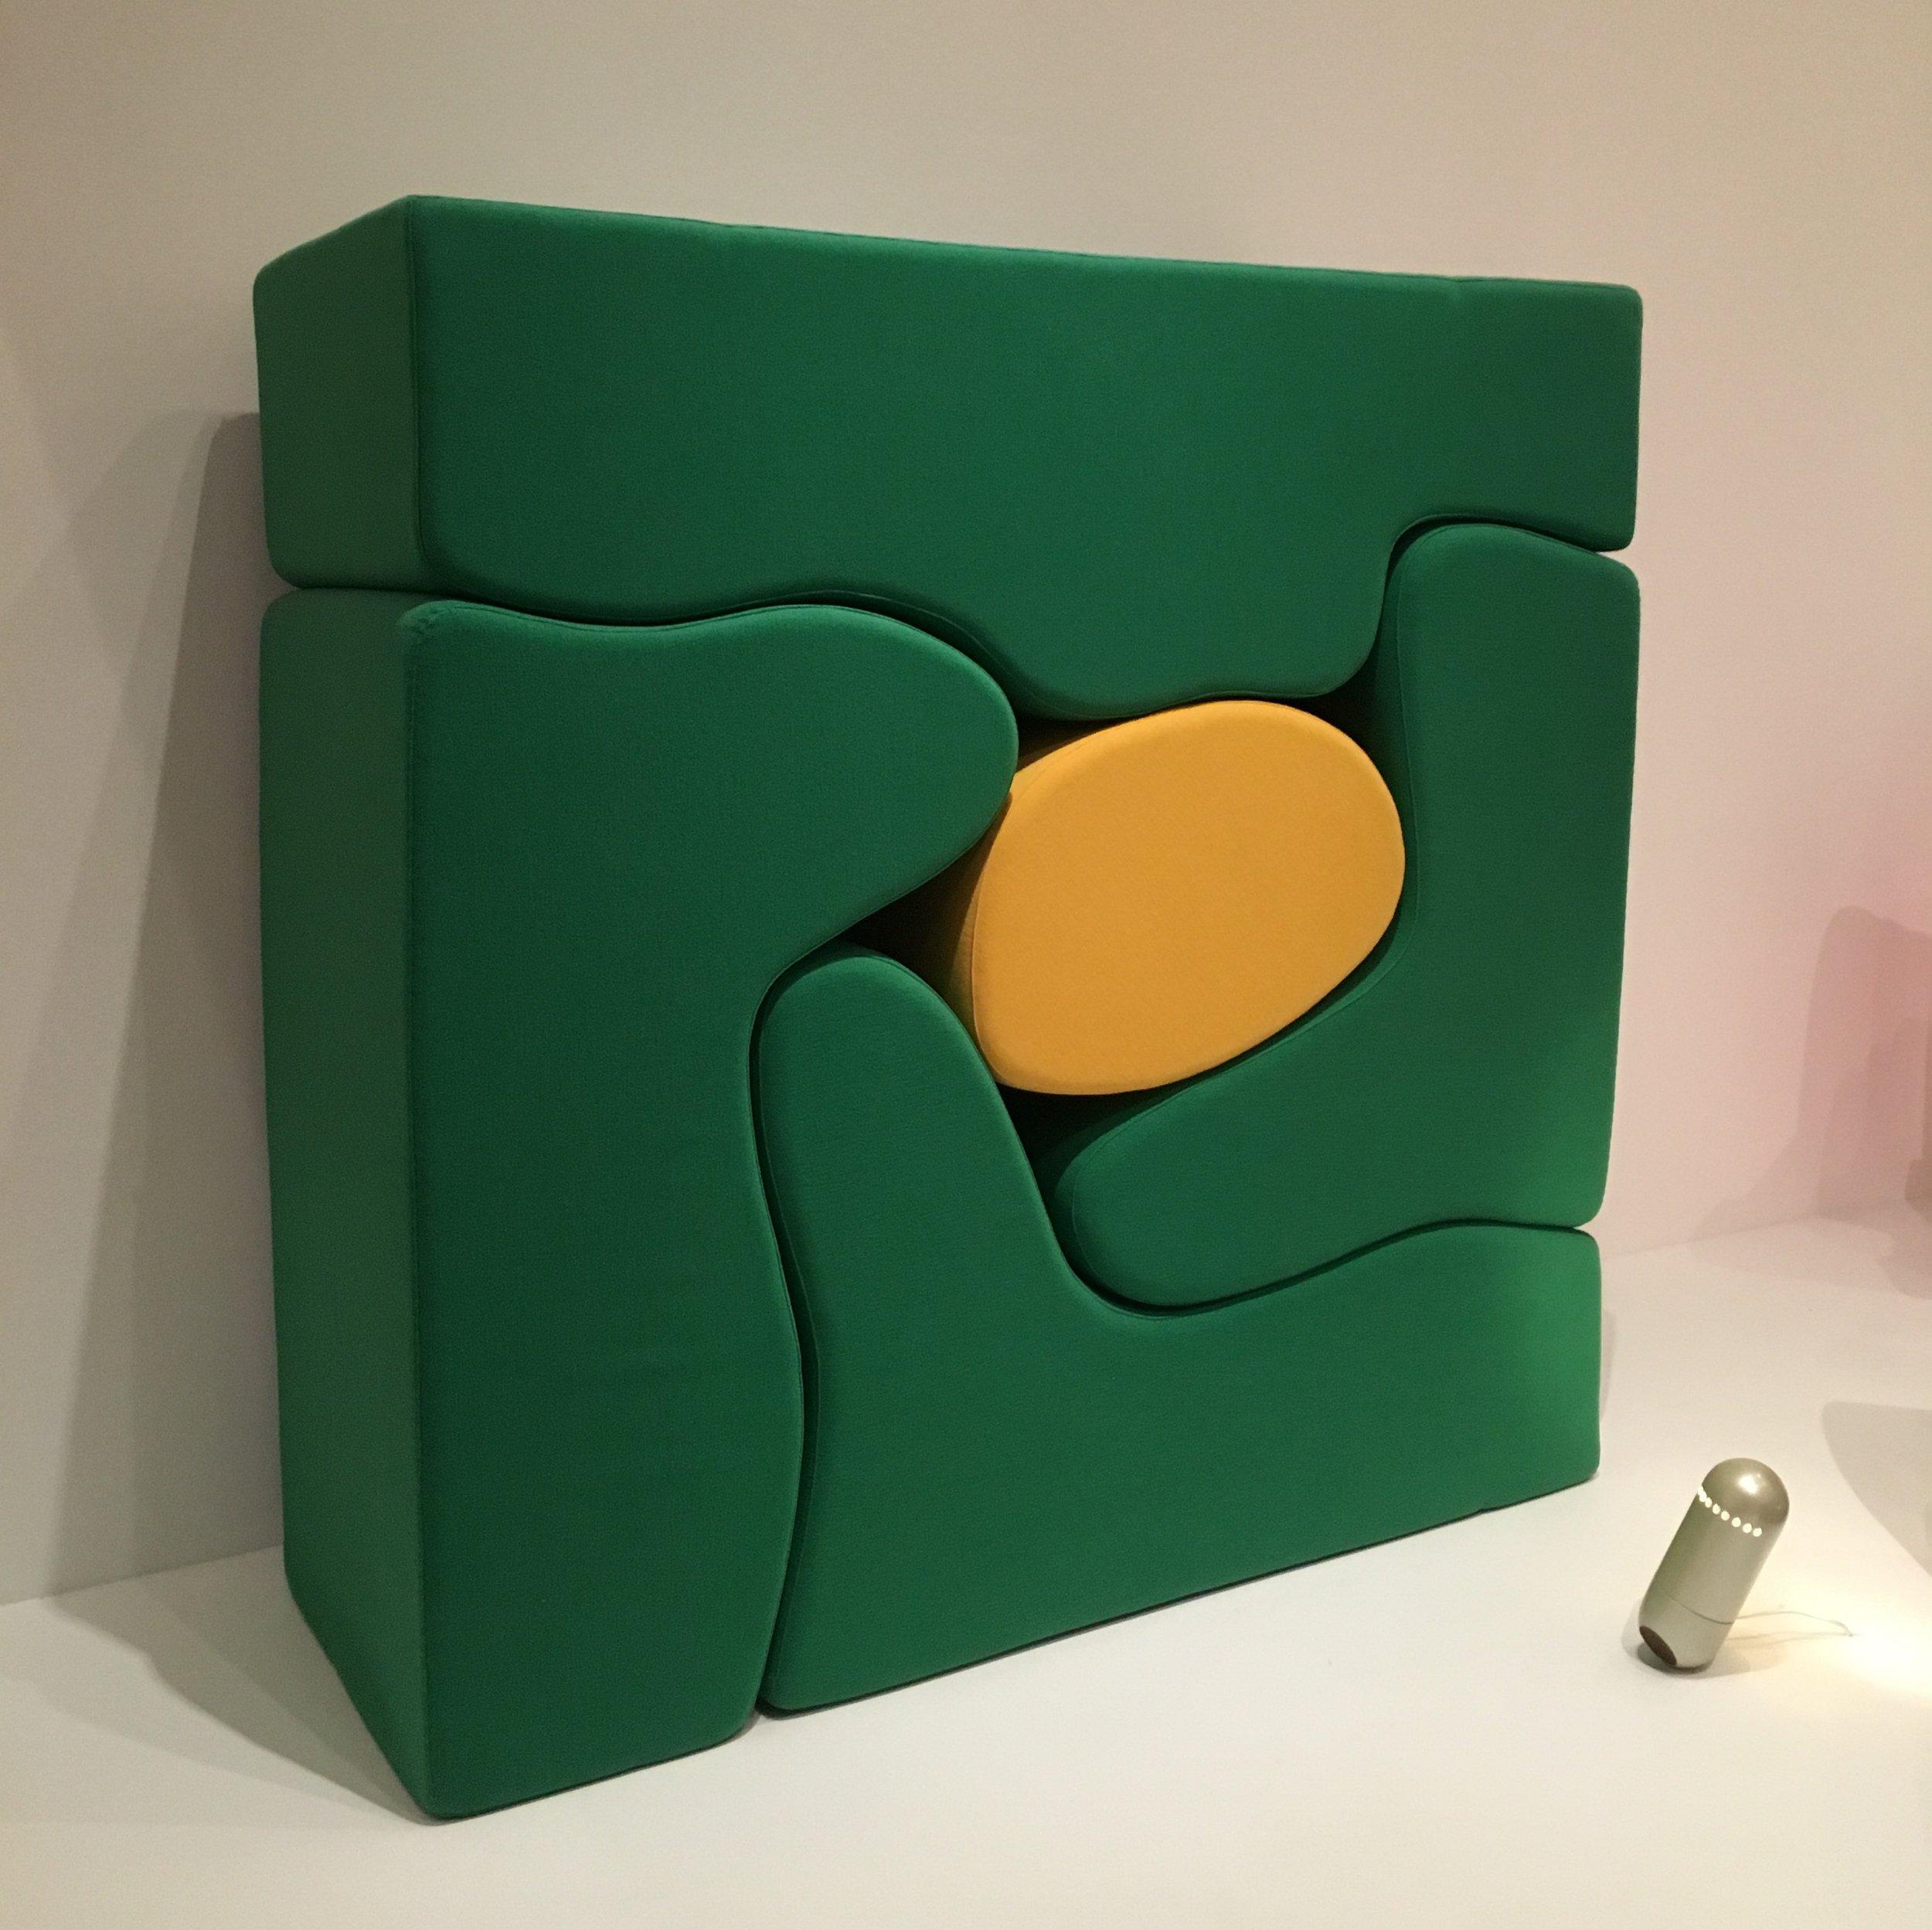 Roberto Matta, Malitte Lounge Furniture, 1966, Gavina, Italy, Wool and polyurethane foam, Object number 473.1970.a-e